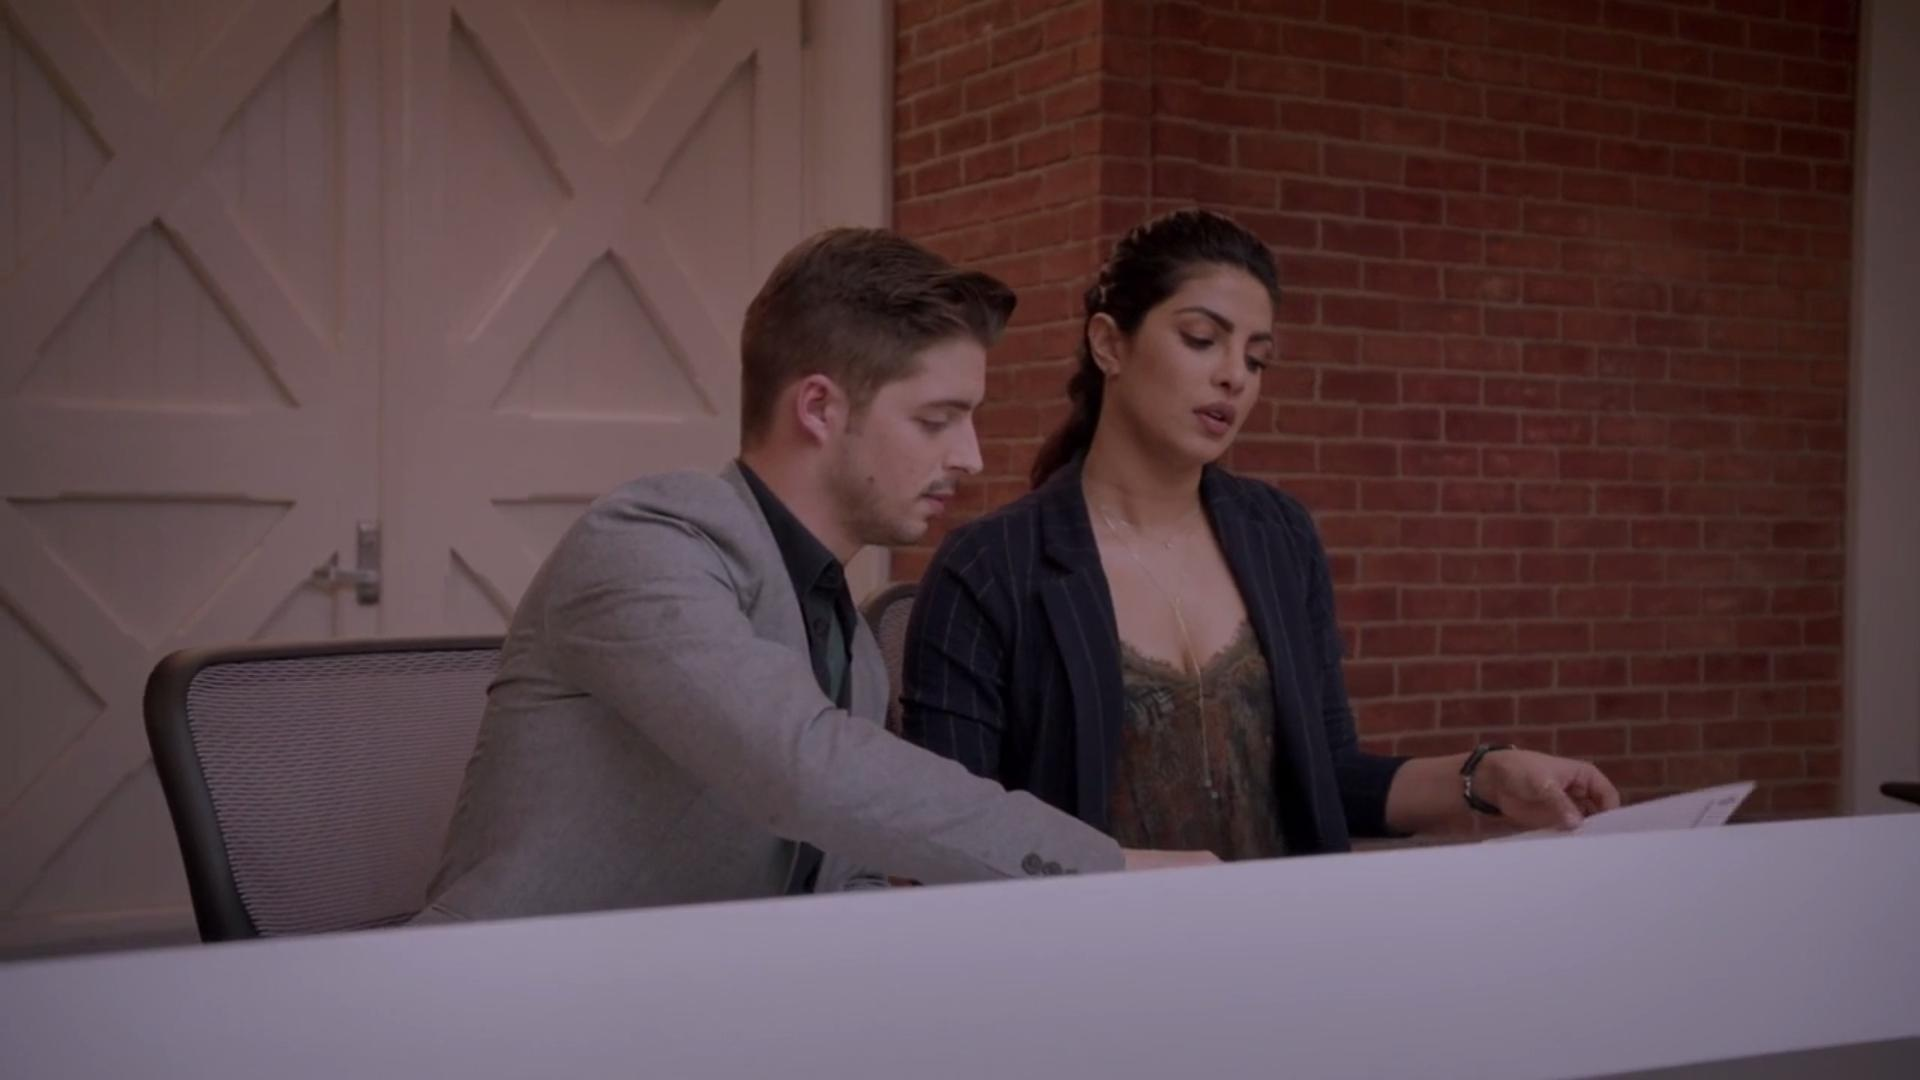 Priyanka Chopra Jonas and Billy Peck in Quantico (2015)